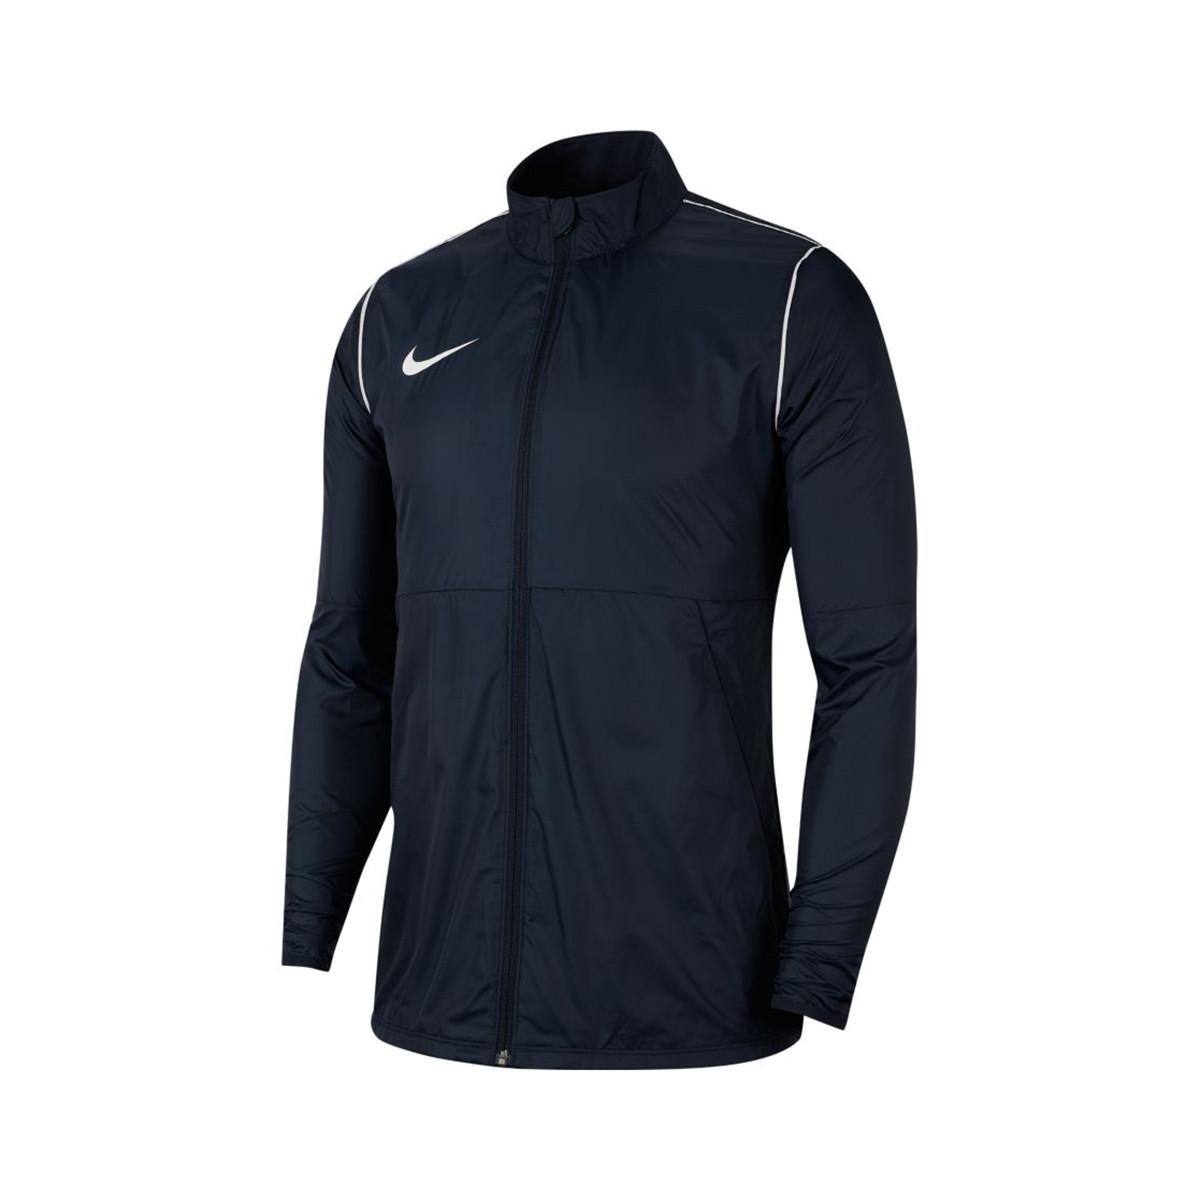 sarcoma Organizar Simposio  Raincoat Nike Park 20 Obsidian - Football store Fútbol Emotion